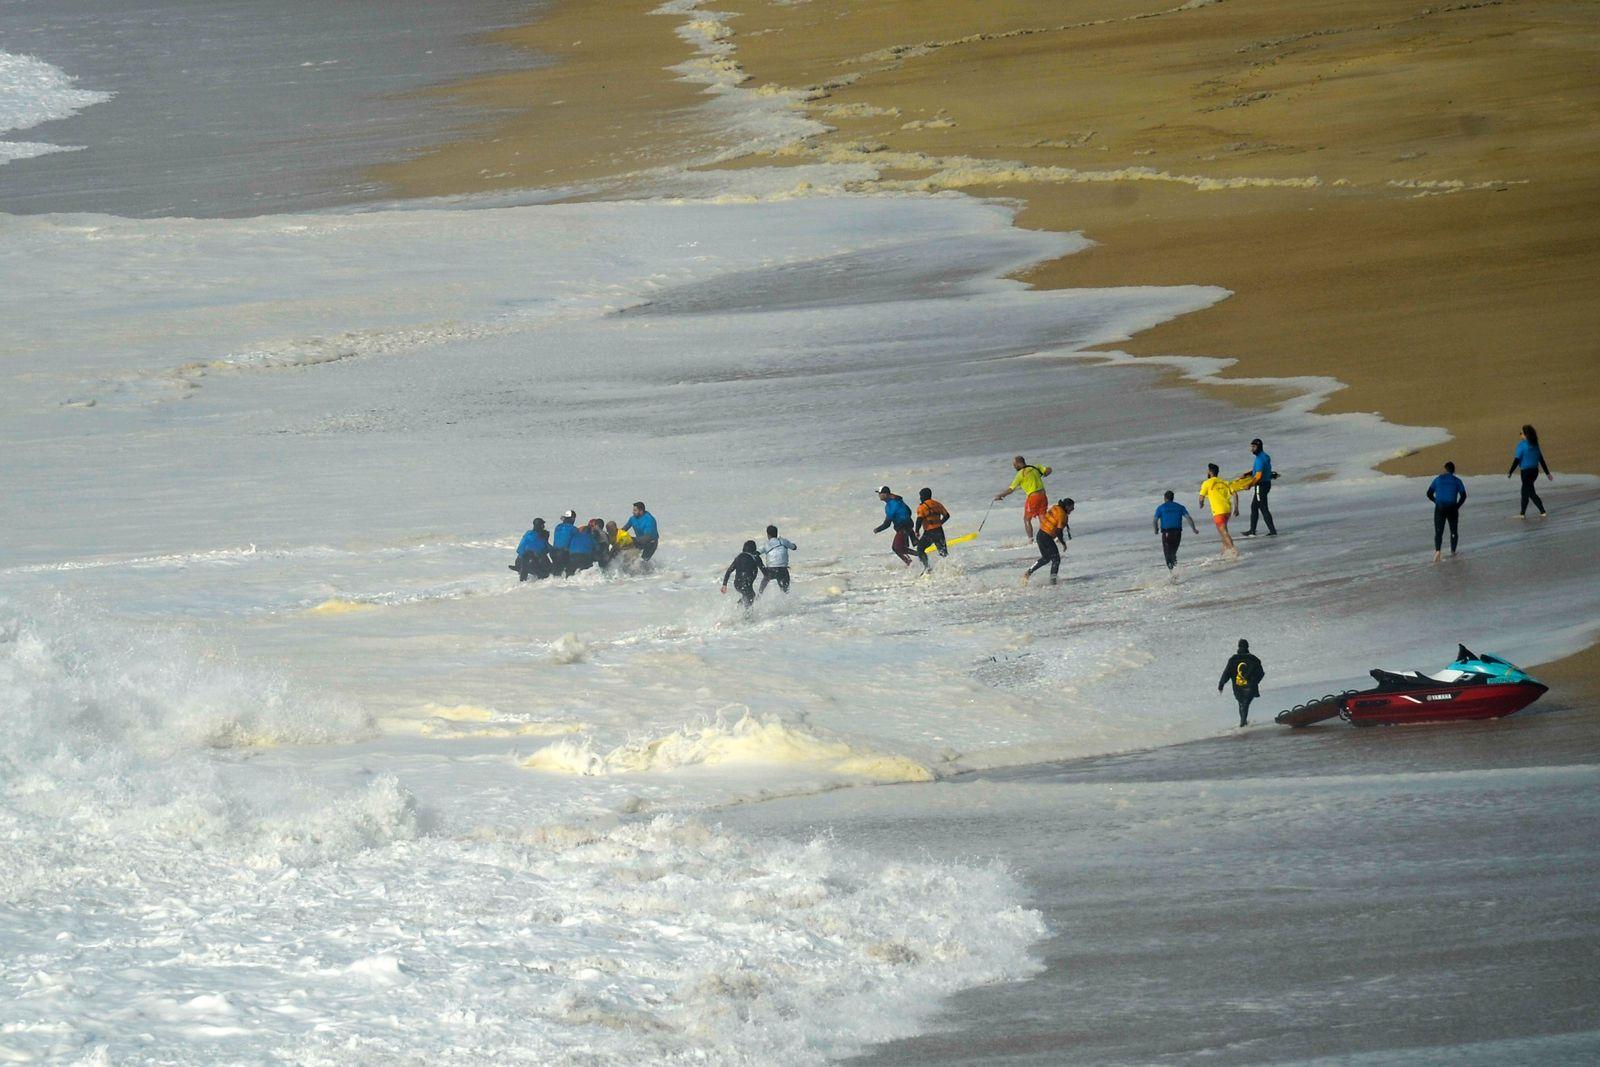 World Surf League: Nazare Tour Surfing Challenge, Portugal - 11 Feb 2020